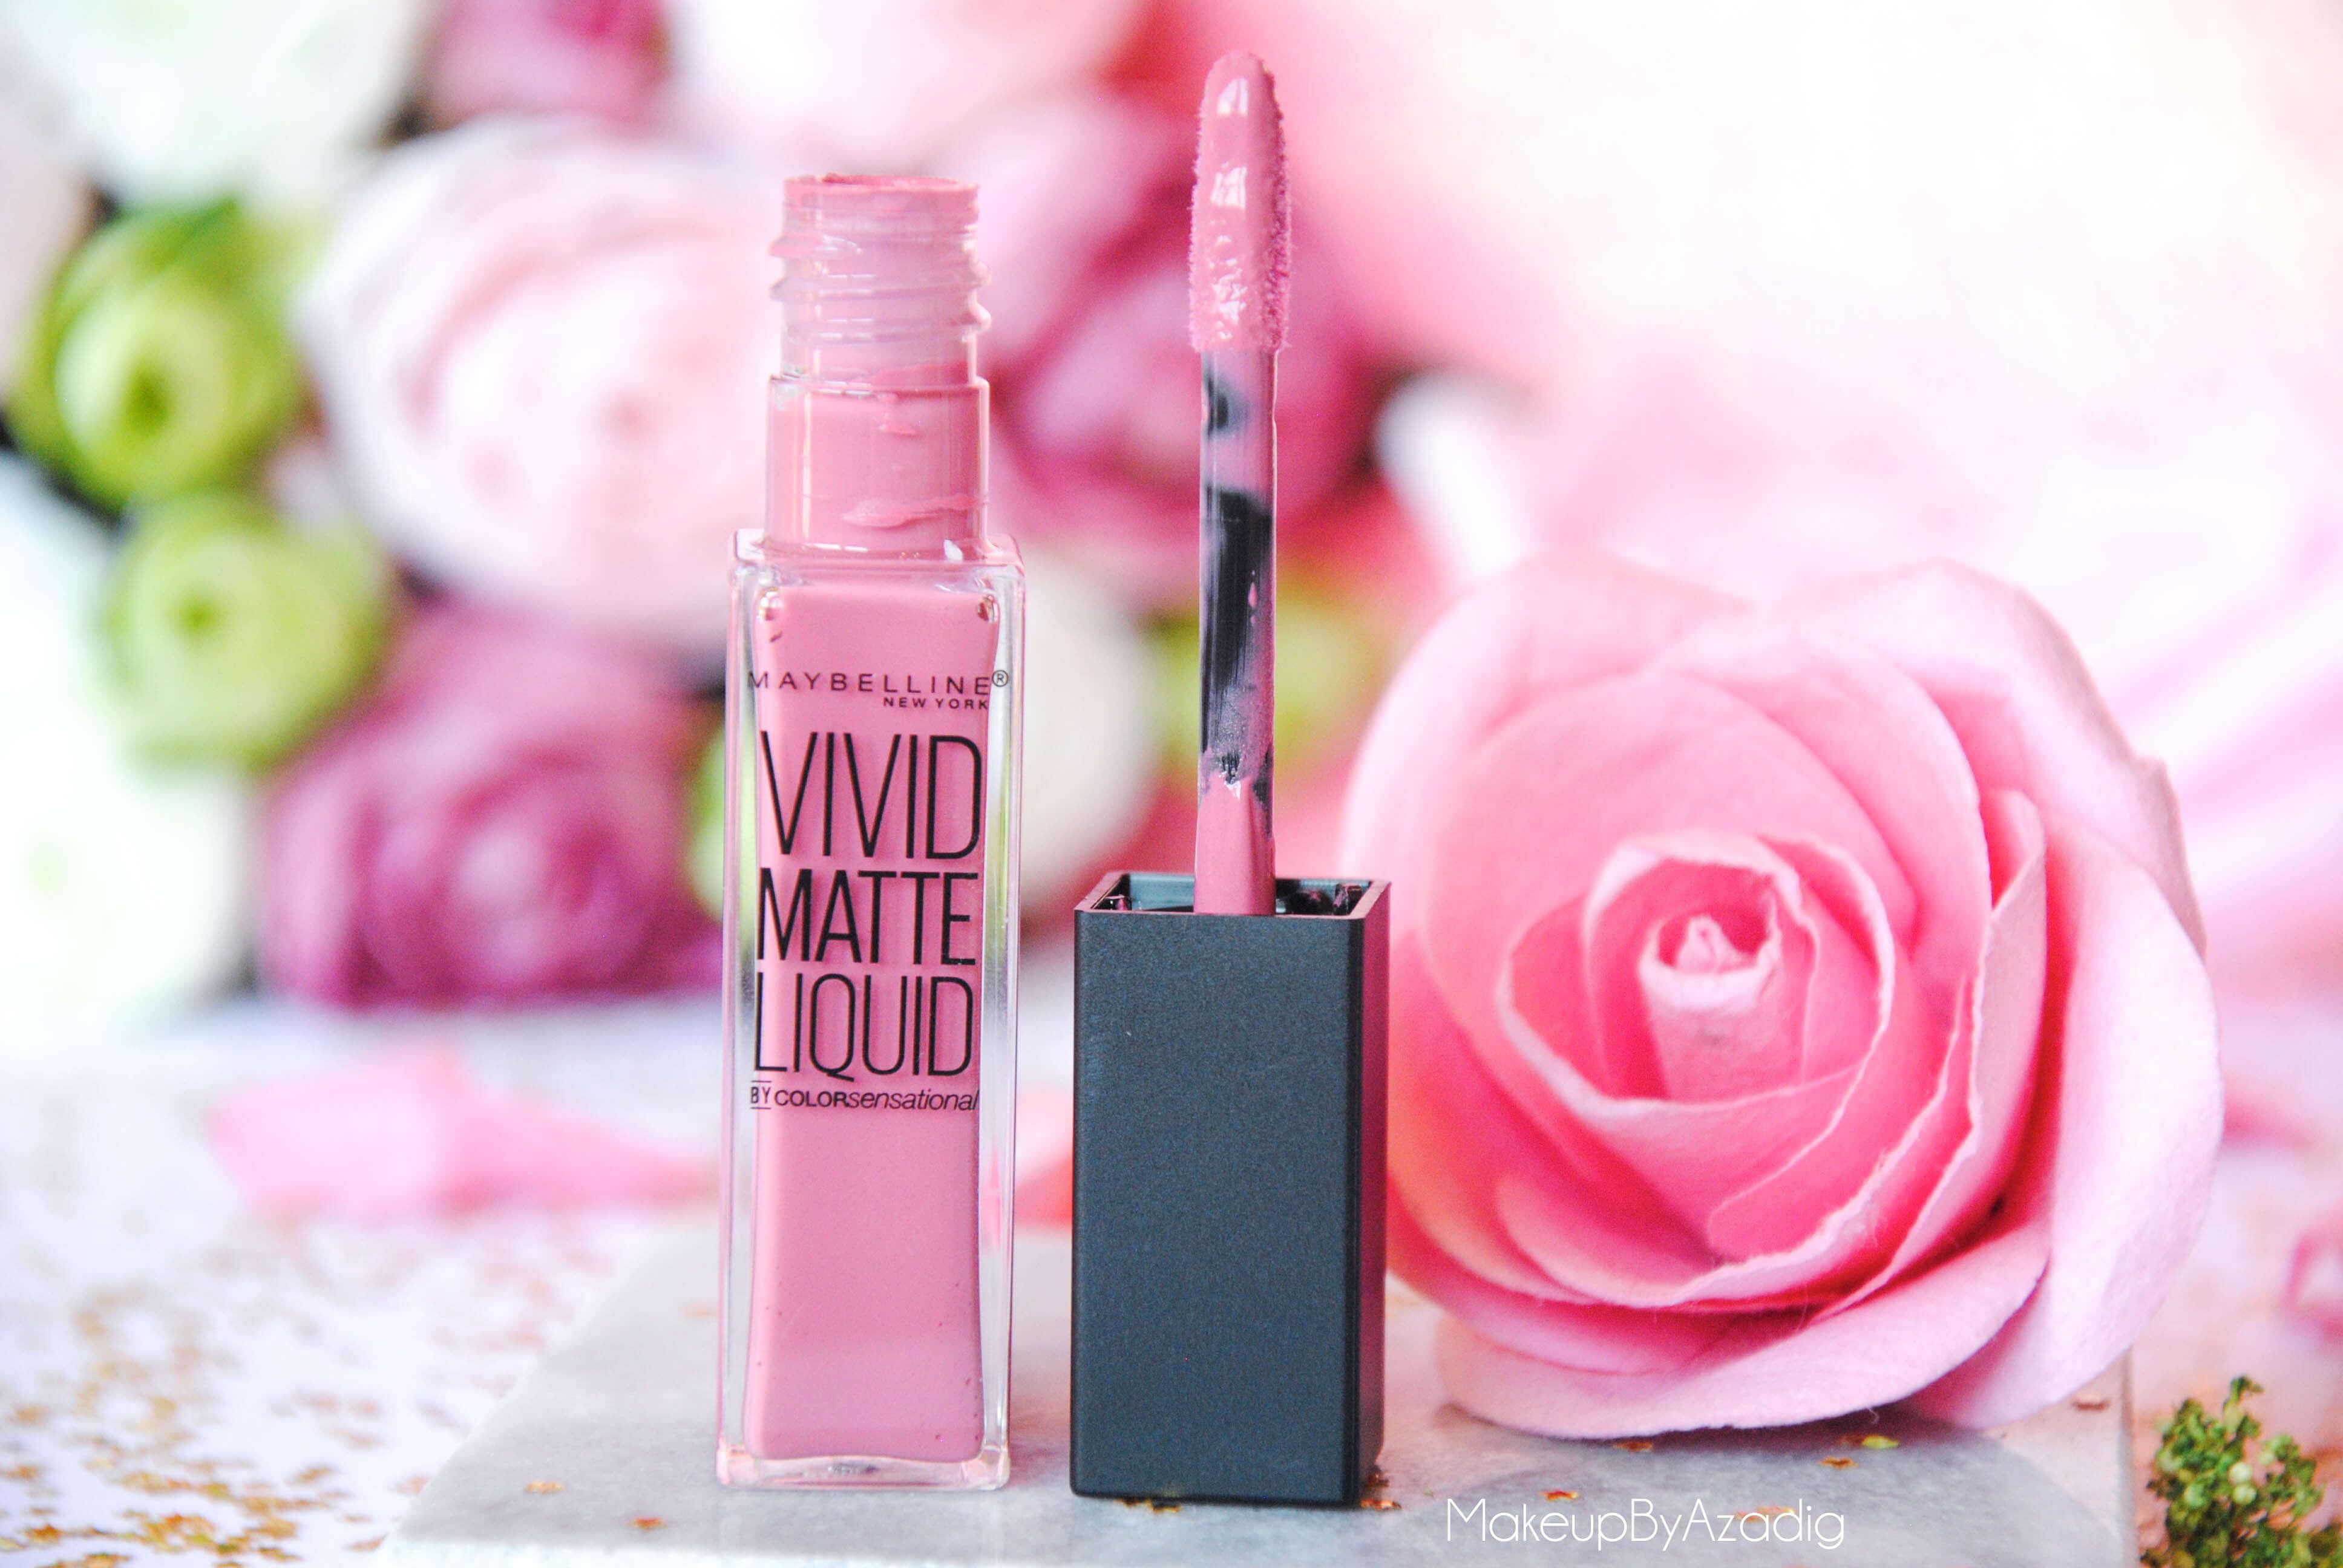 makeupbyazadig-troyes-gemey-maybelline-new-york-nude-flush-orange-shot-possessed-plum-berry-boost-fuchsia-ecstasy-corail-courage-vivid-matte-liquid-by-colorsensational-rose